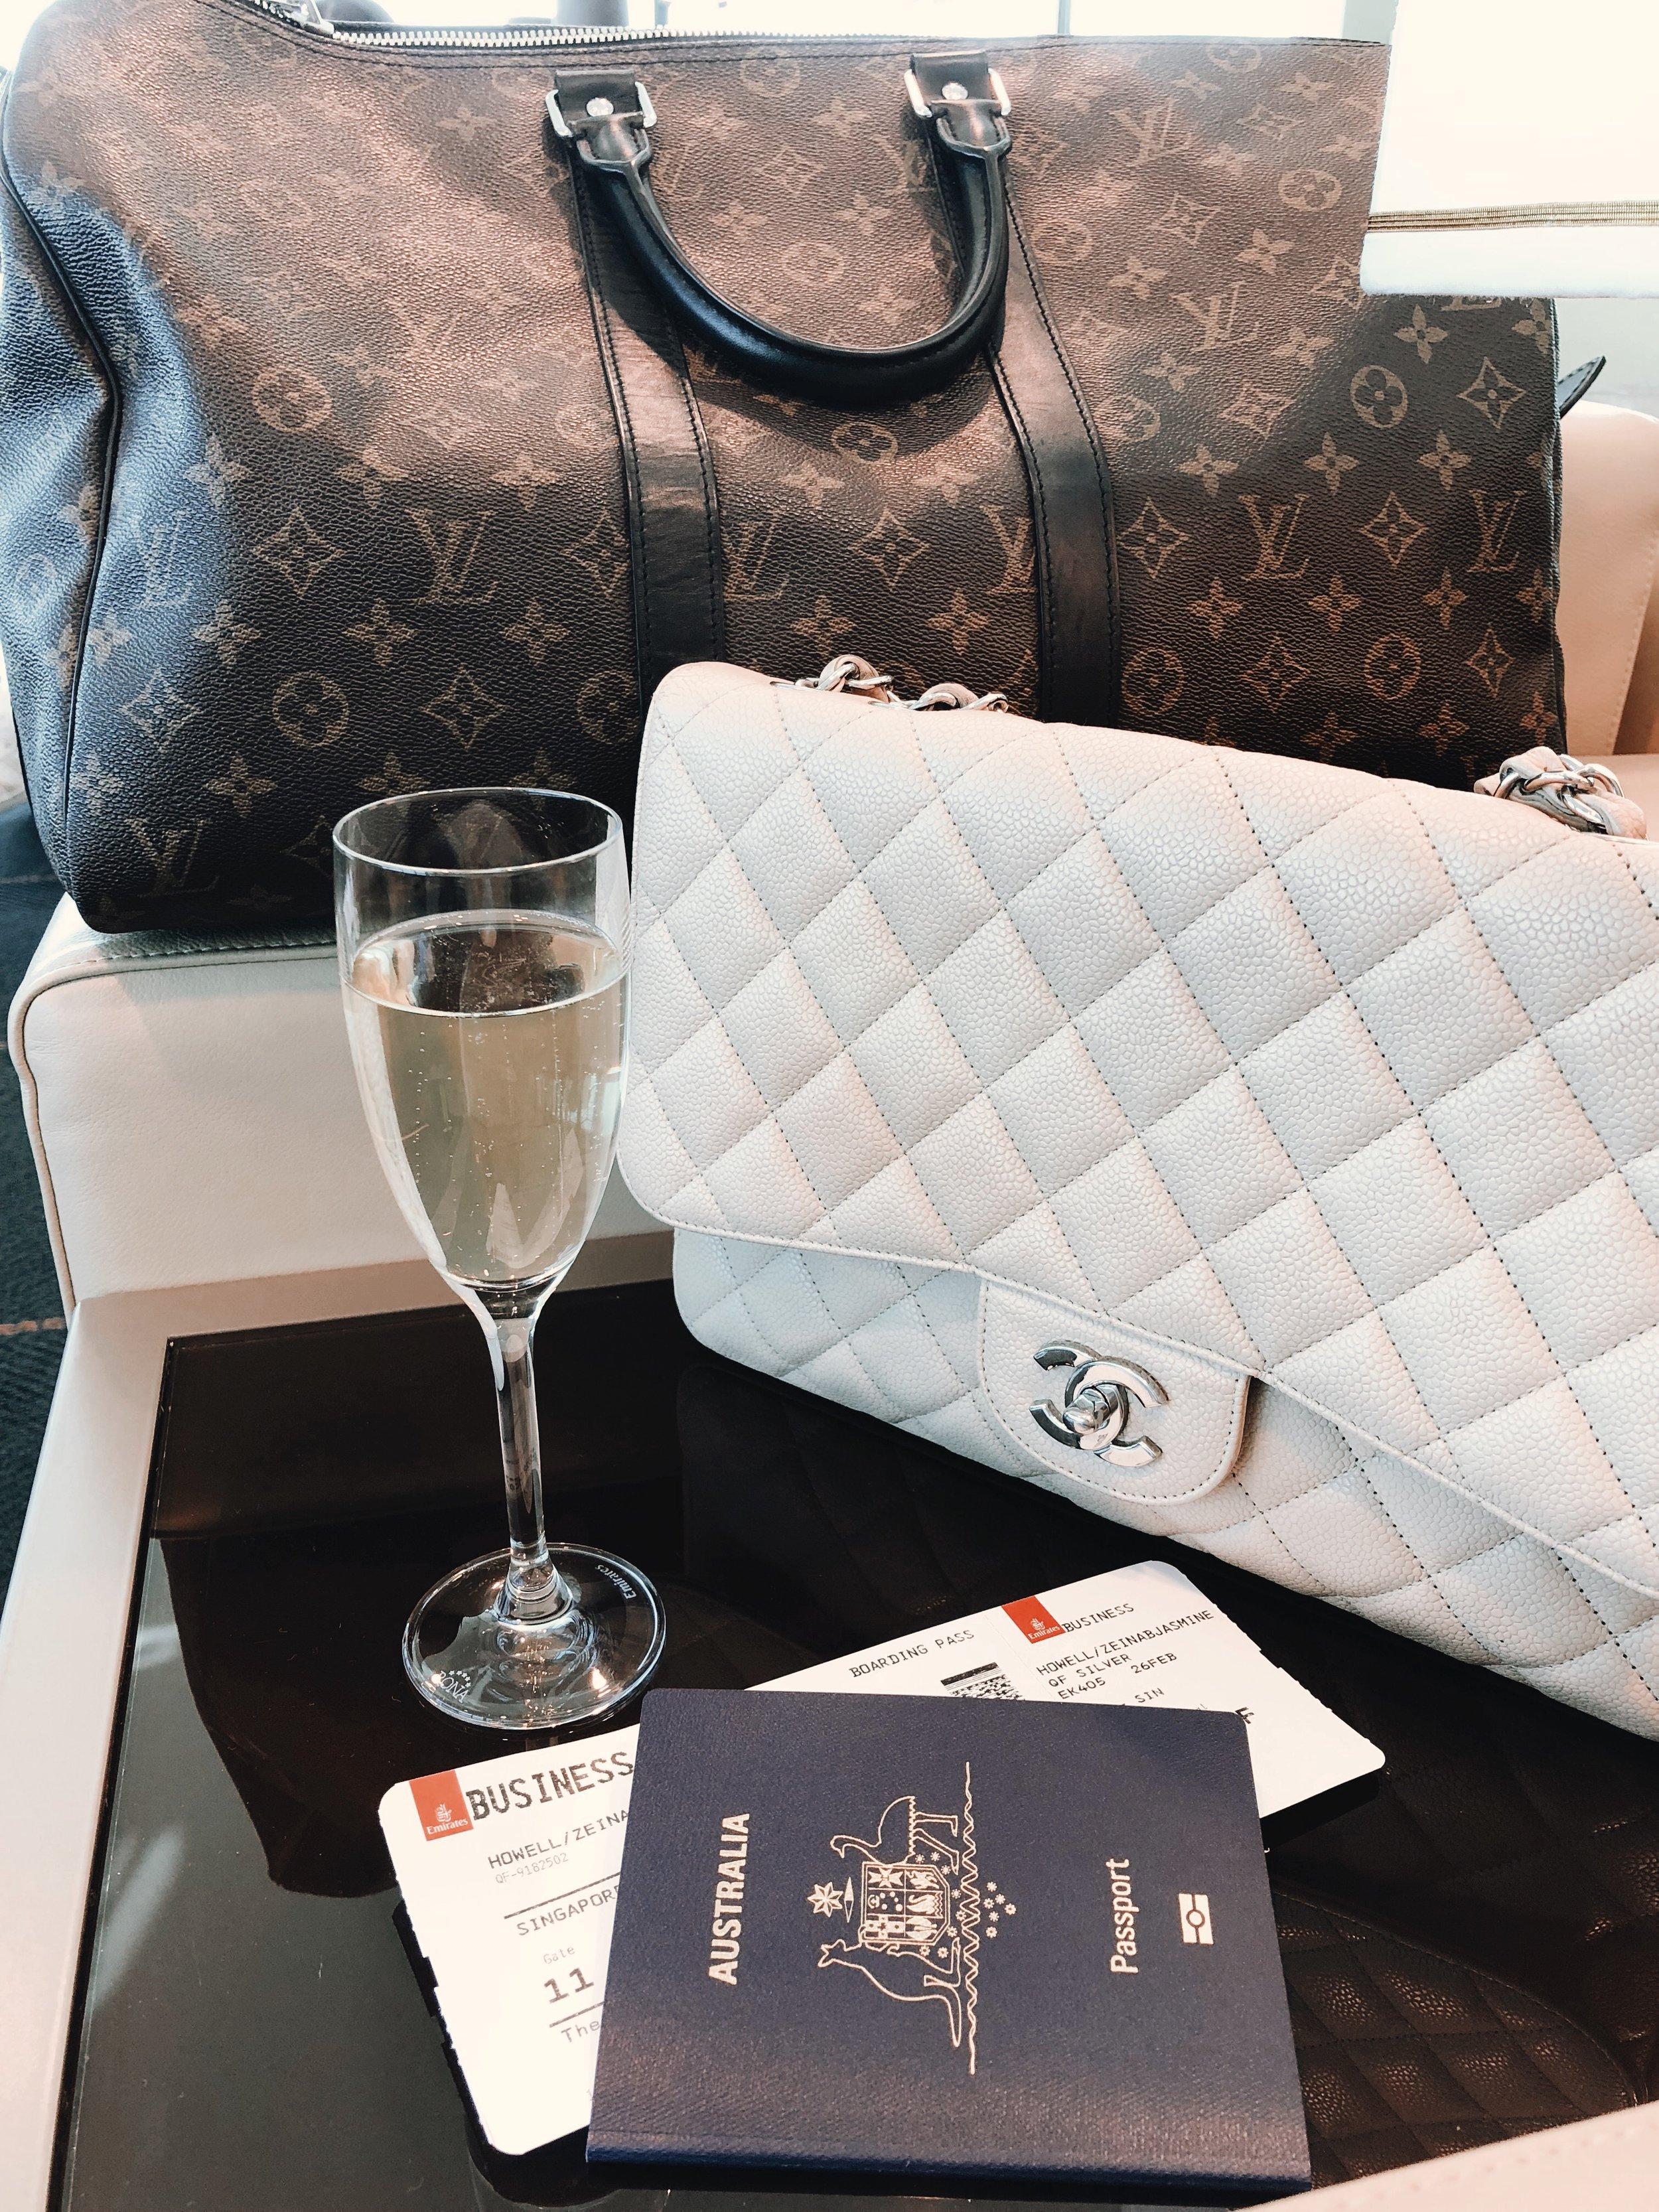 Emirates Business Lounge on www.friendinfashion.com.au